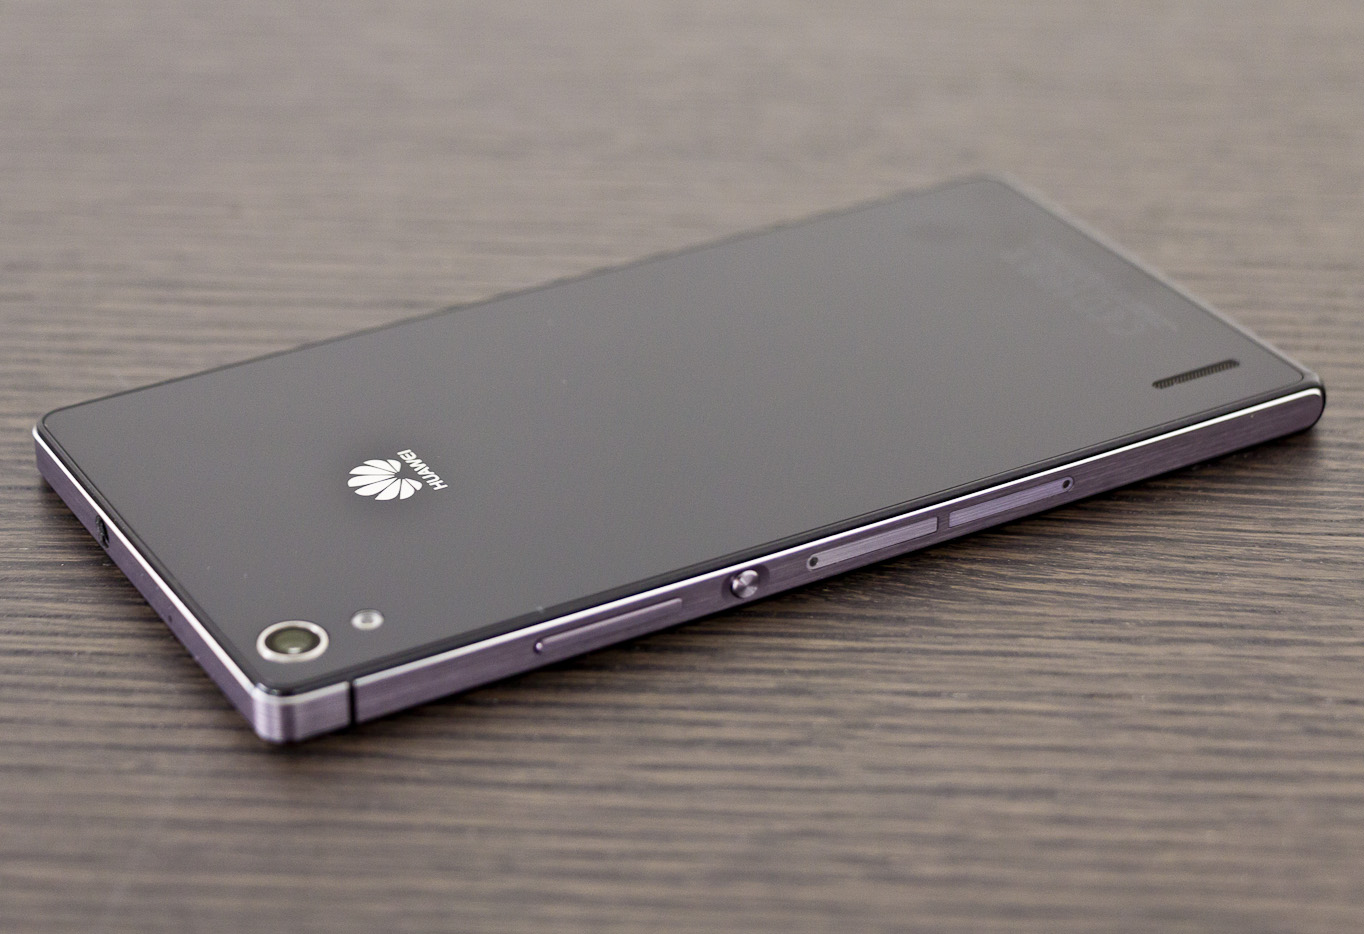 Huawei Ascend P7 Design Technology Ace